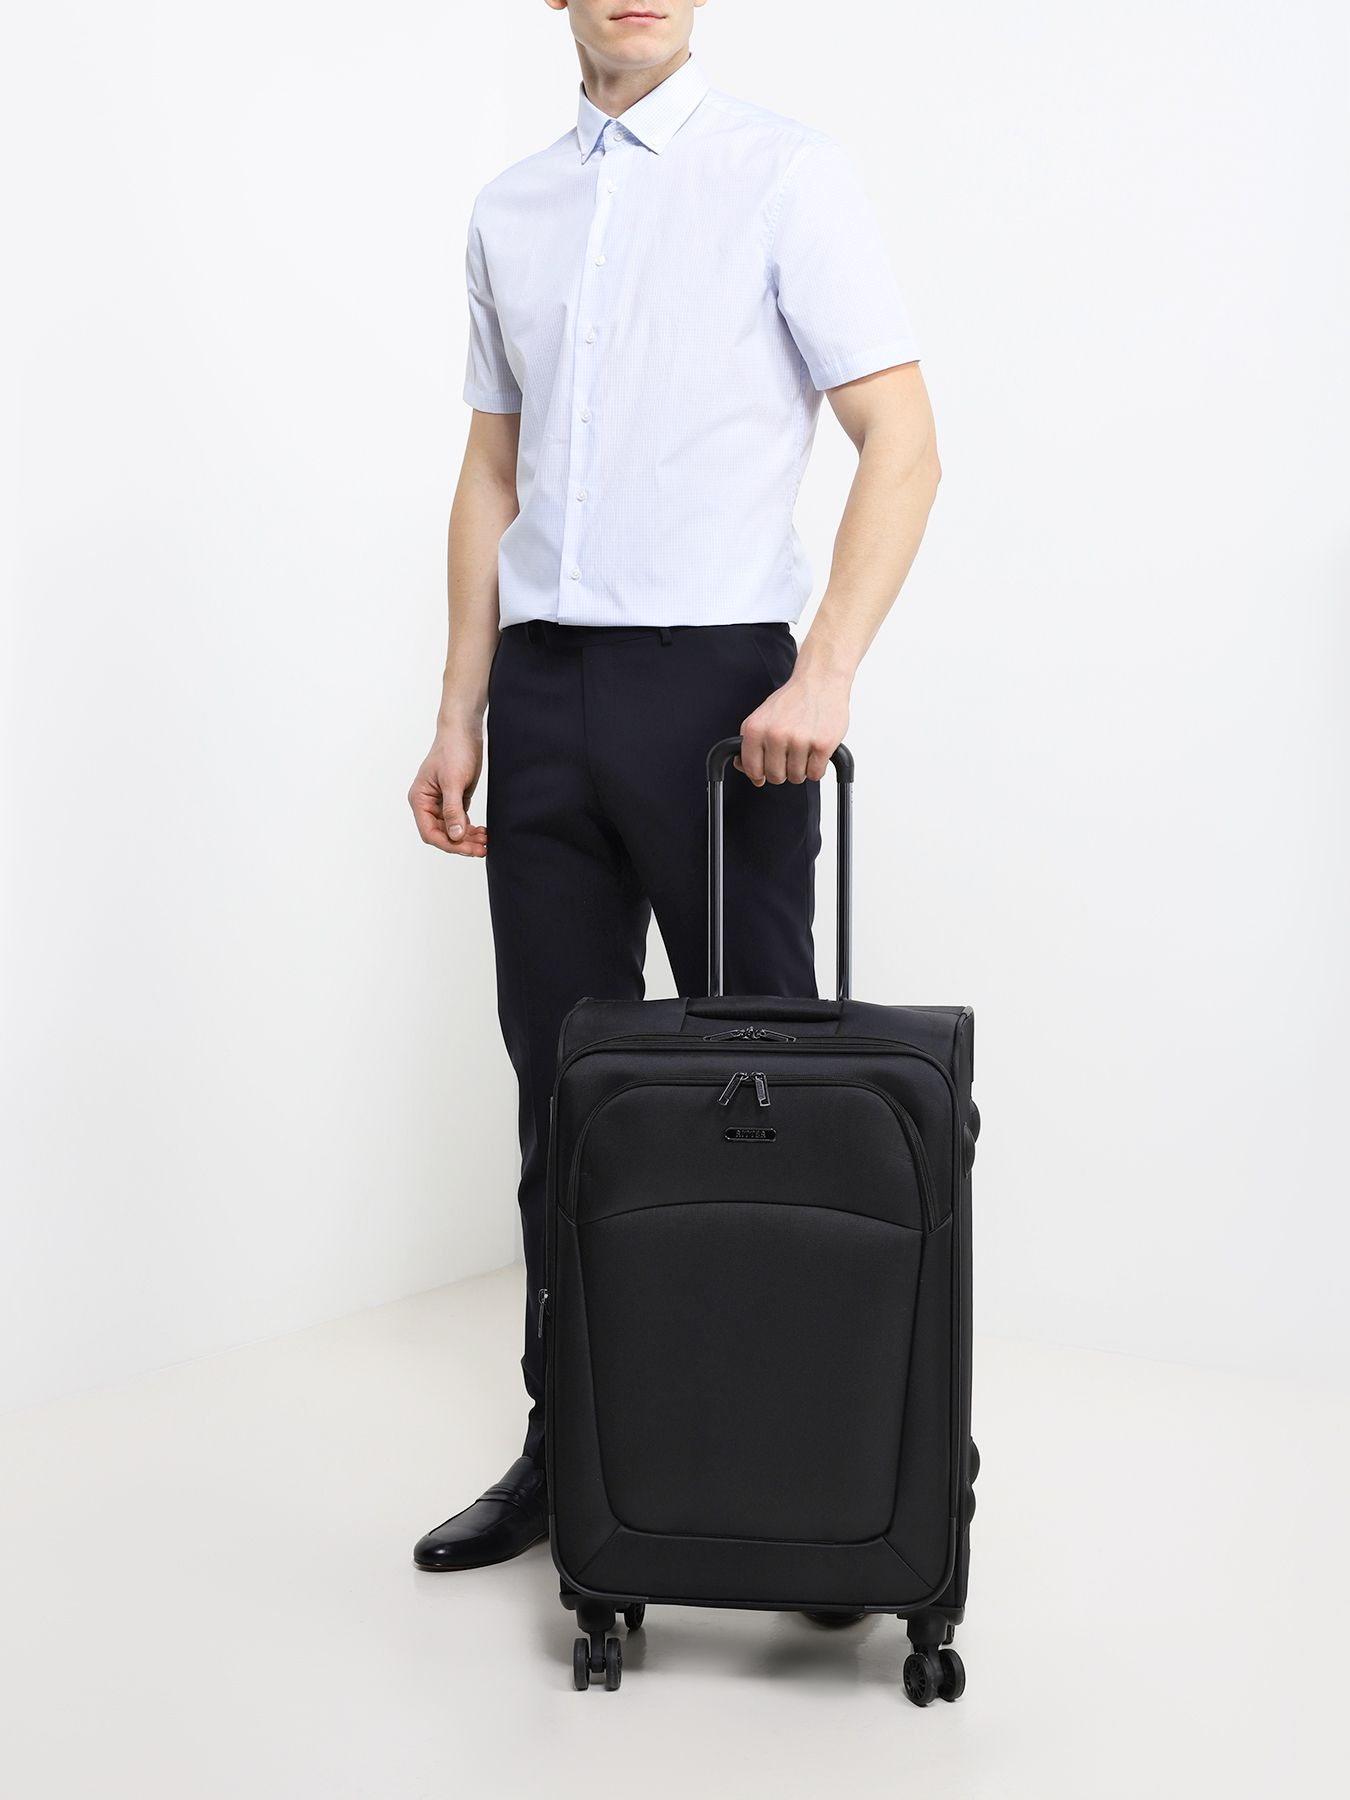 Чемодан Ritter Чемодан RC 24 чемодан ritter чемодан rc 20